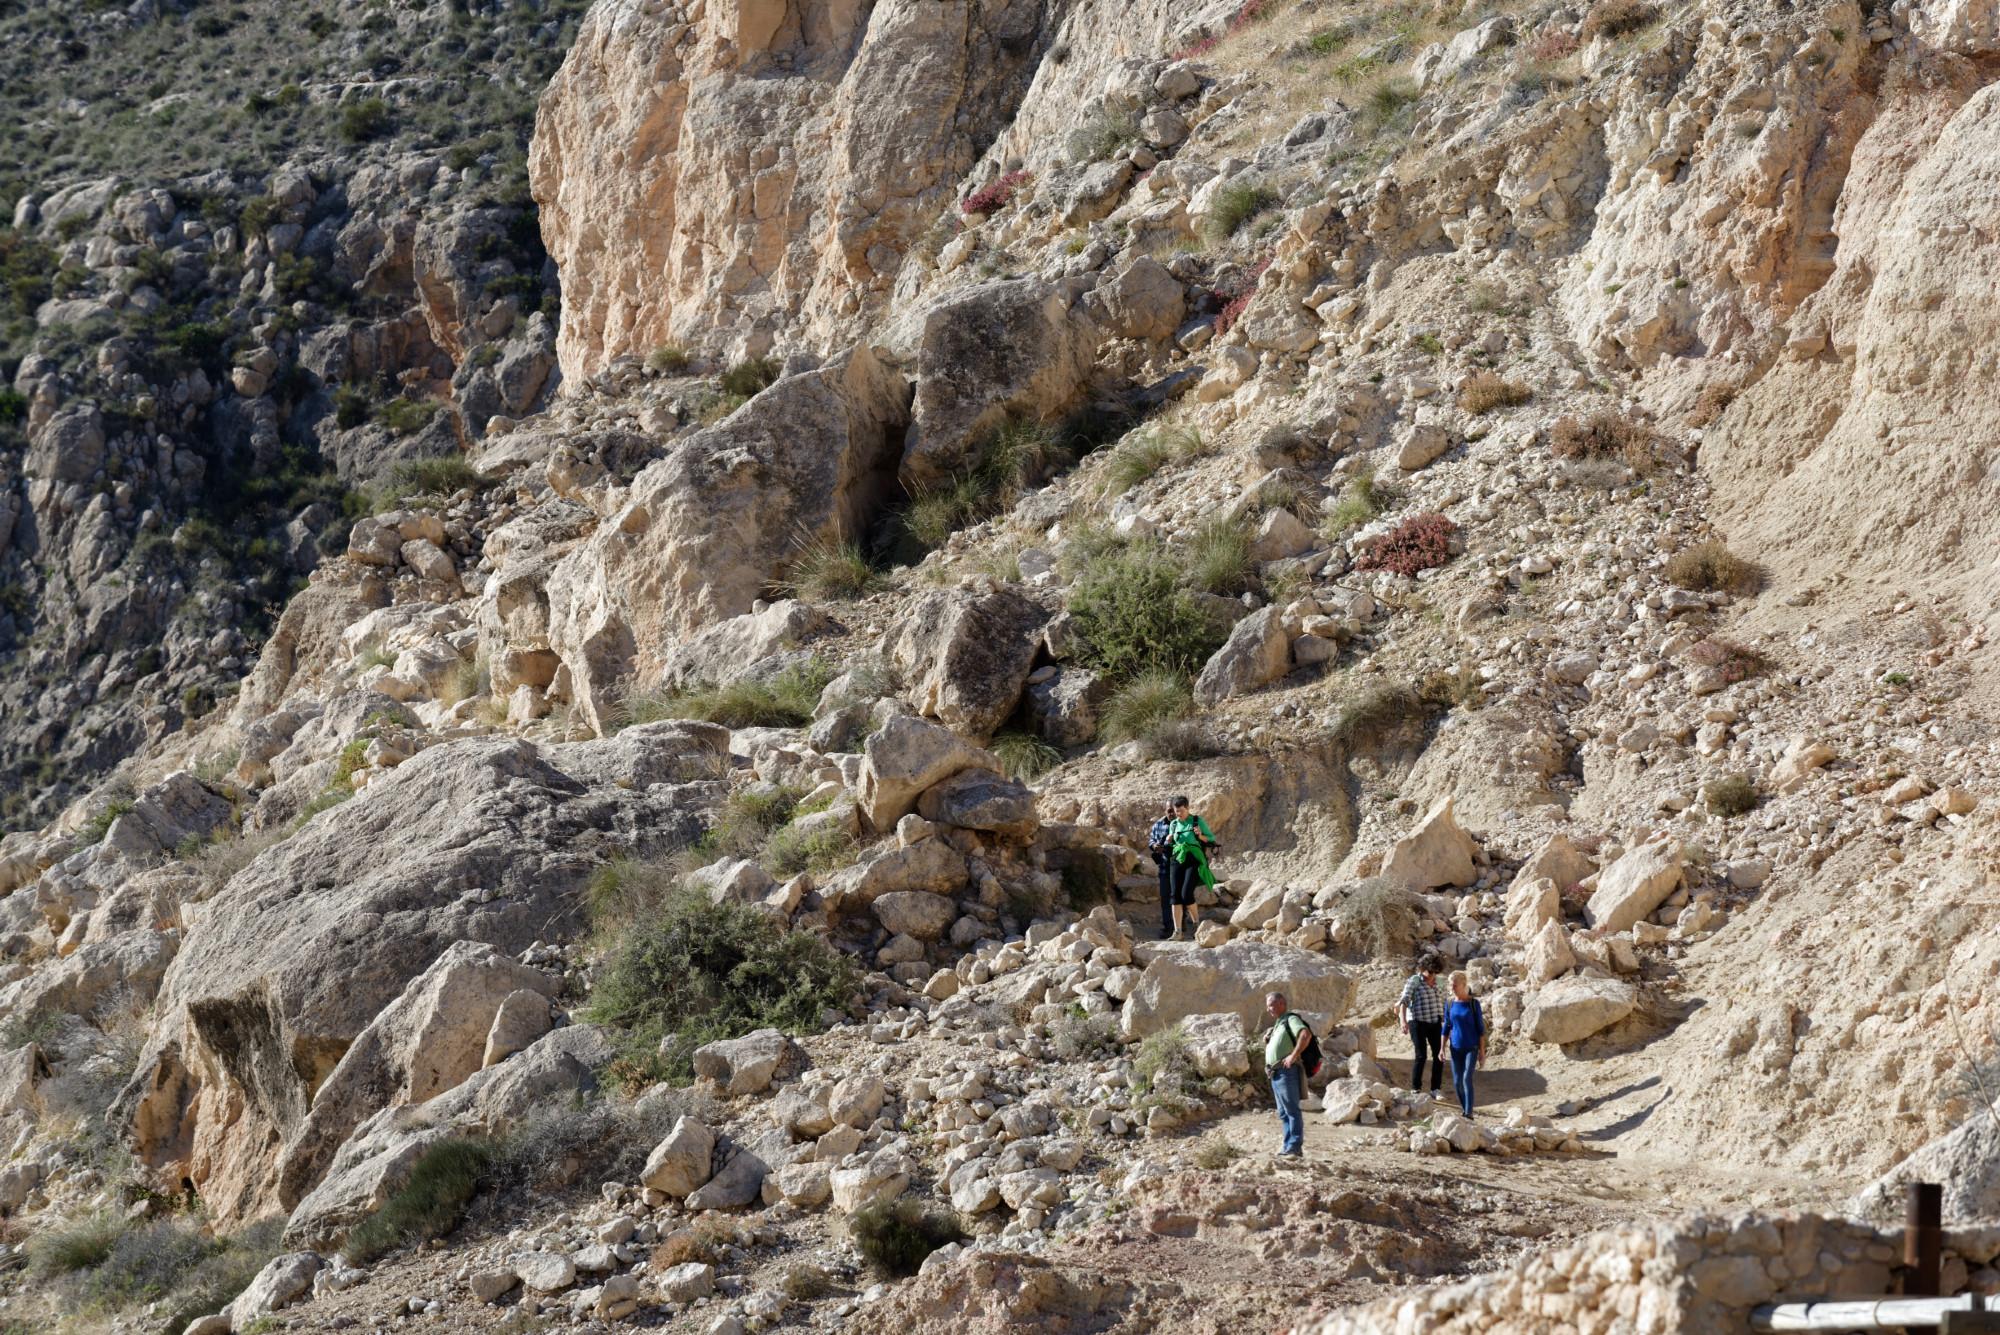 171213-Marche Las Negras-Cala San Pedro-Las Negras (51) (Cabo de Gata-Andalousie)